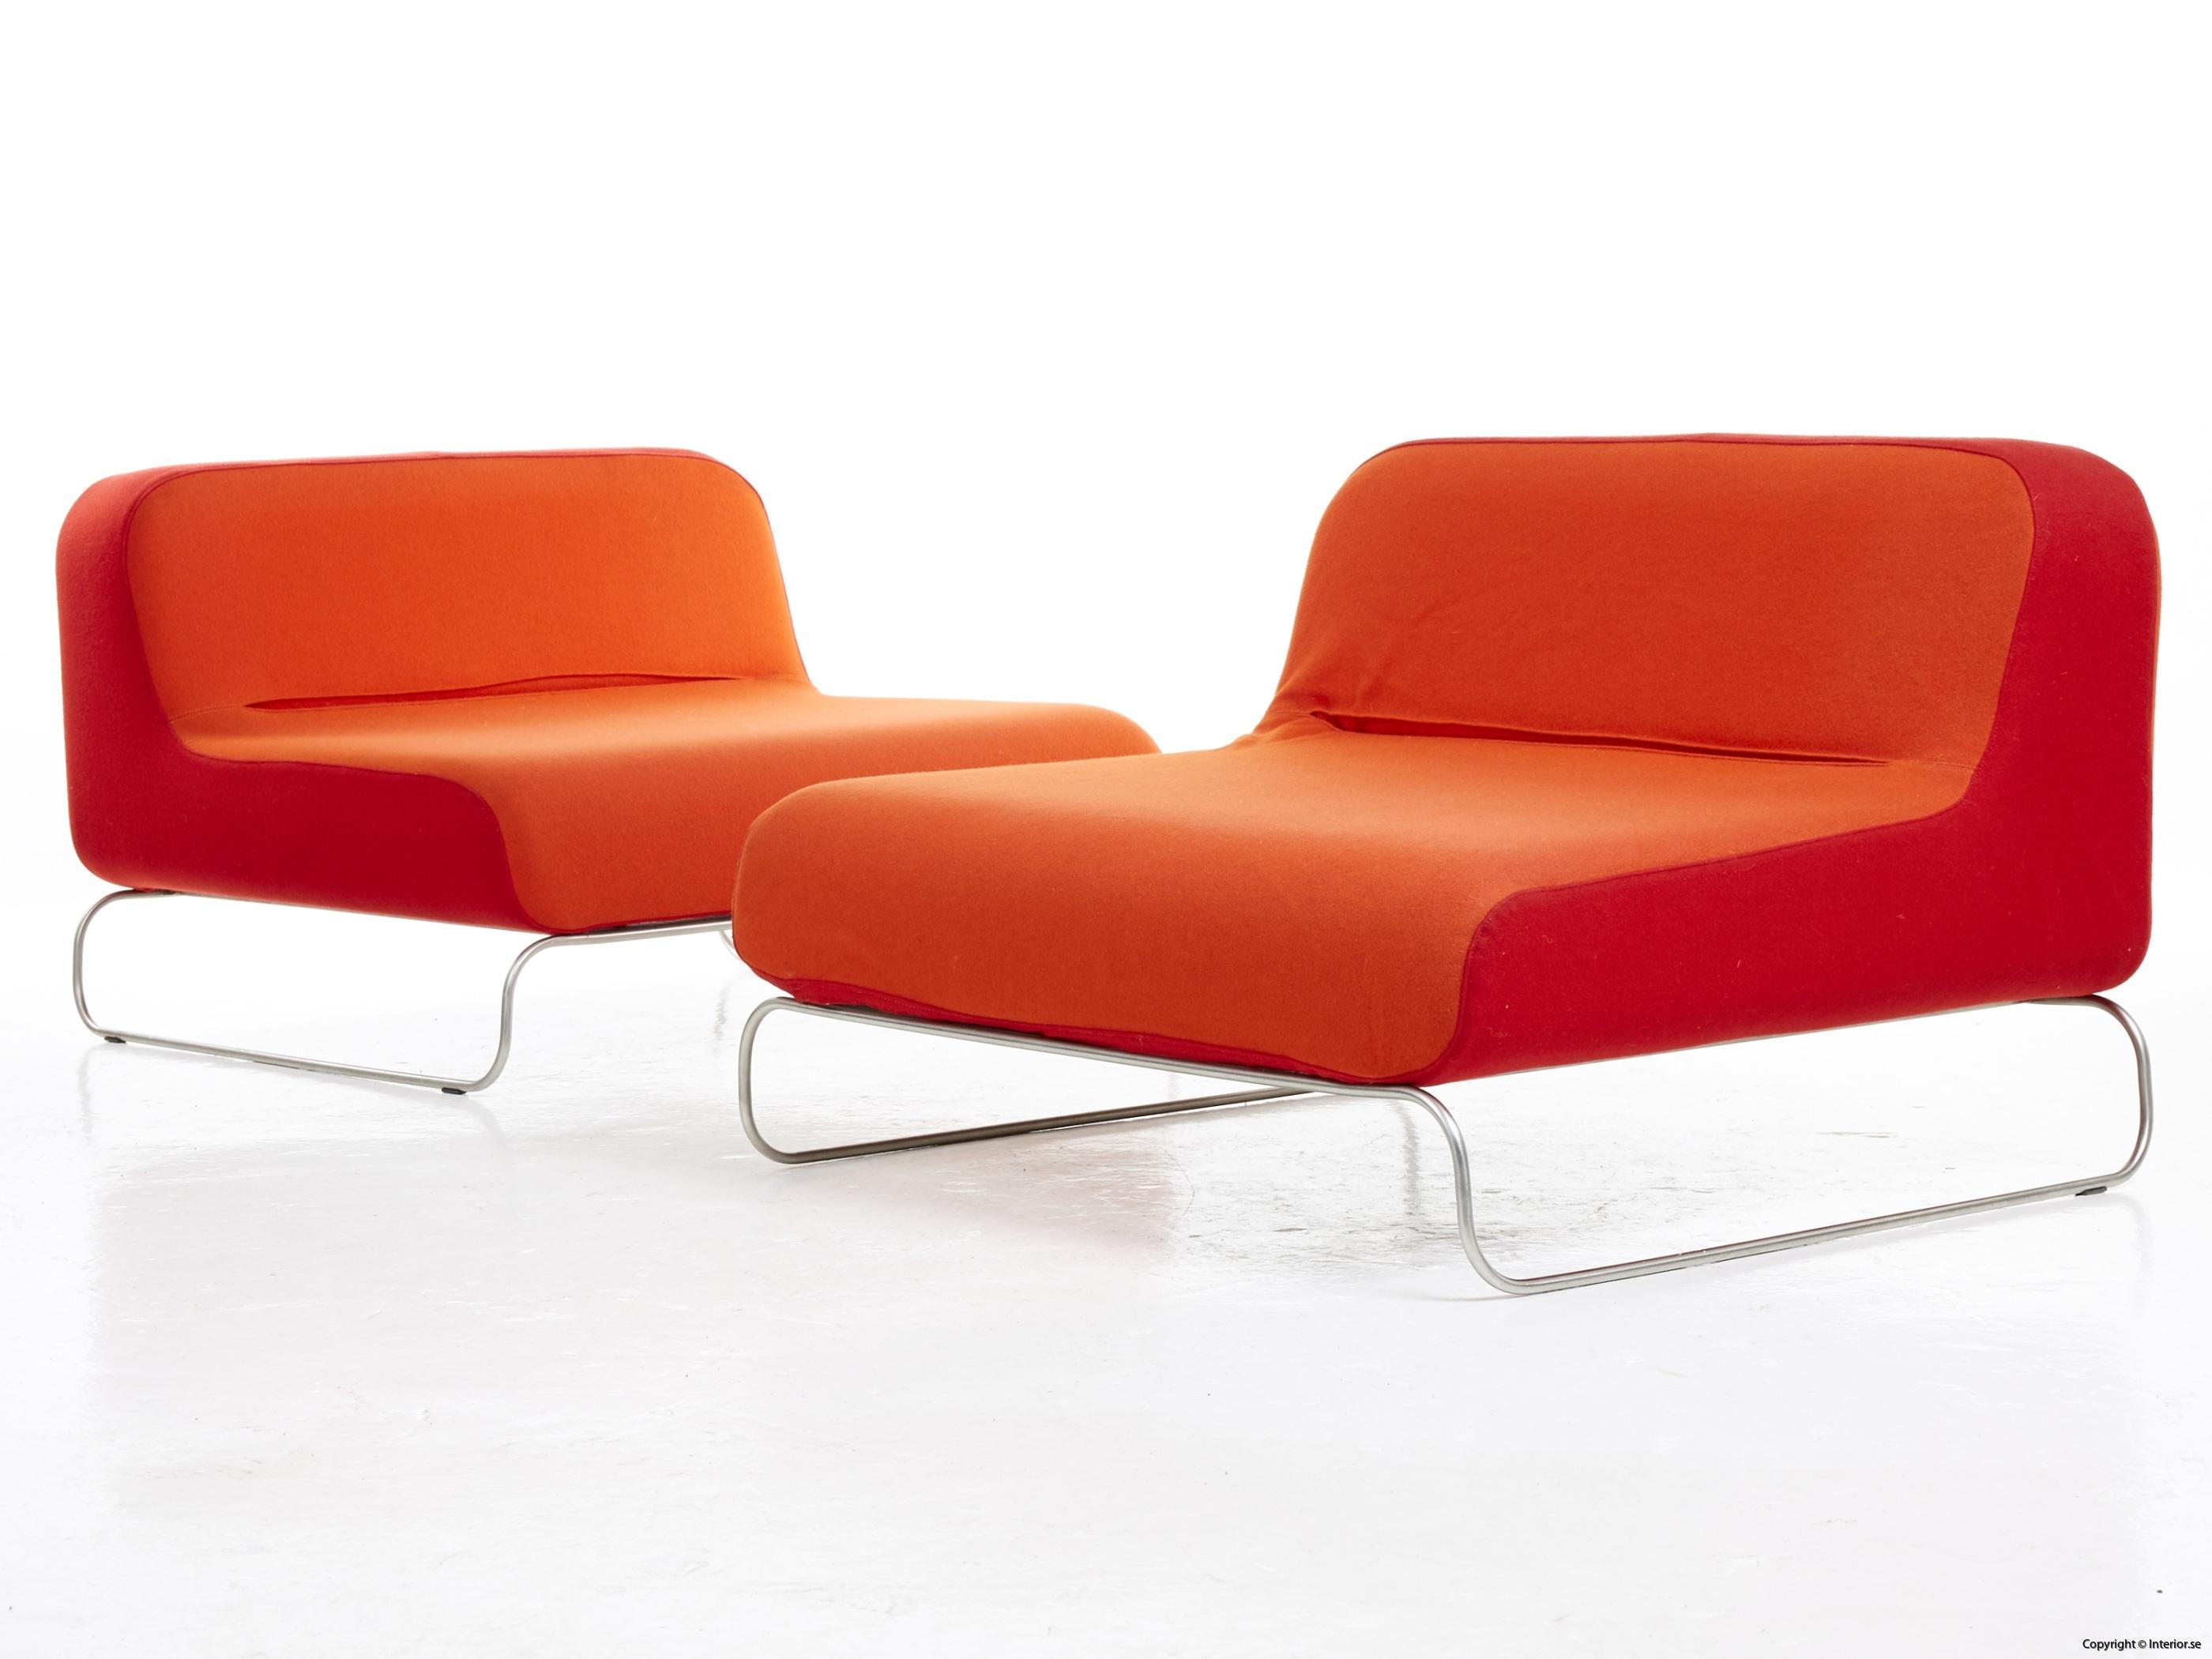 Låga loungefåtöljer, röd  orange snygga fåtöljer